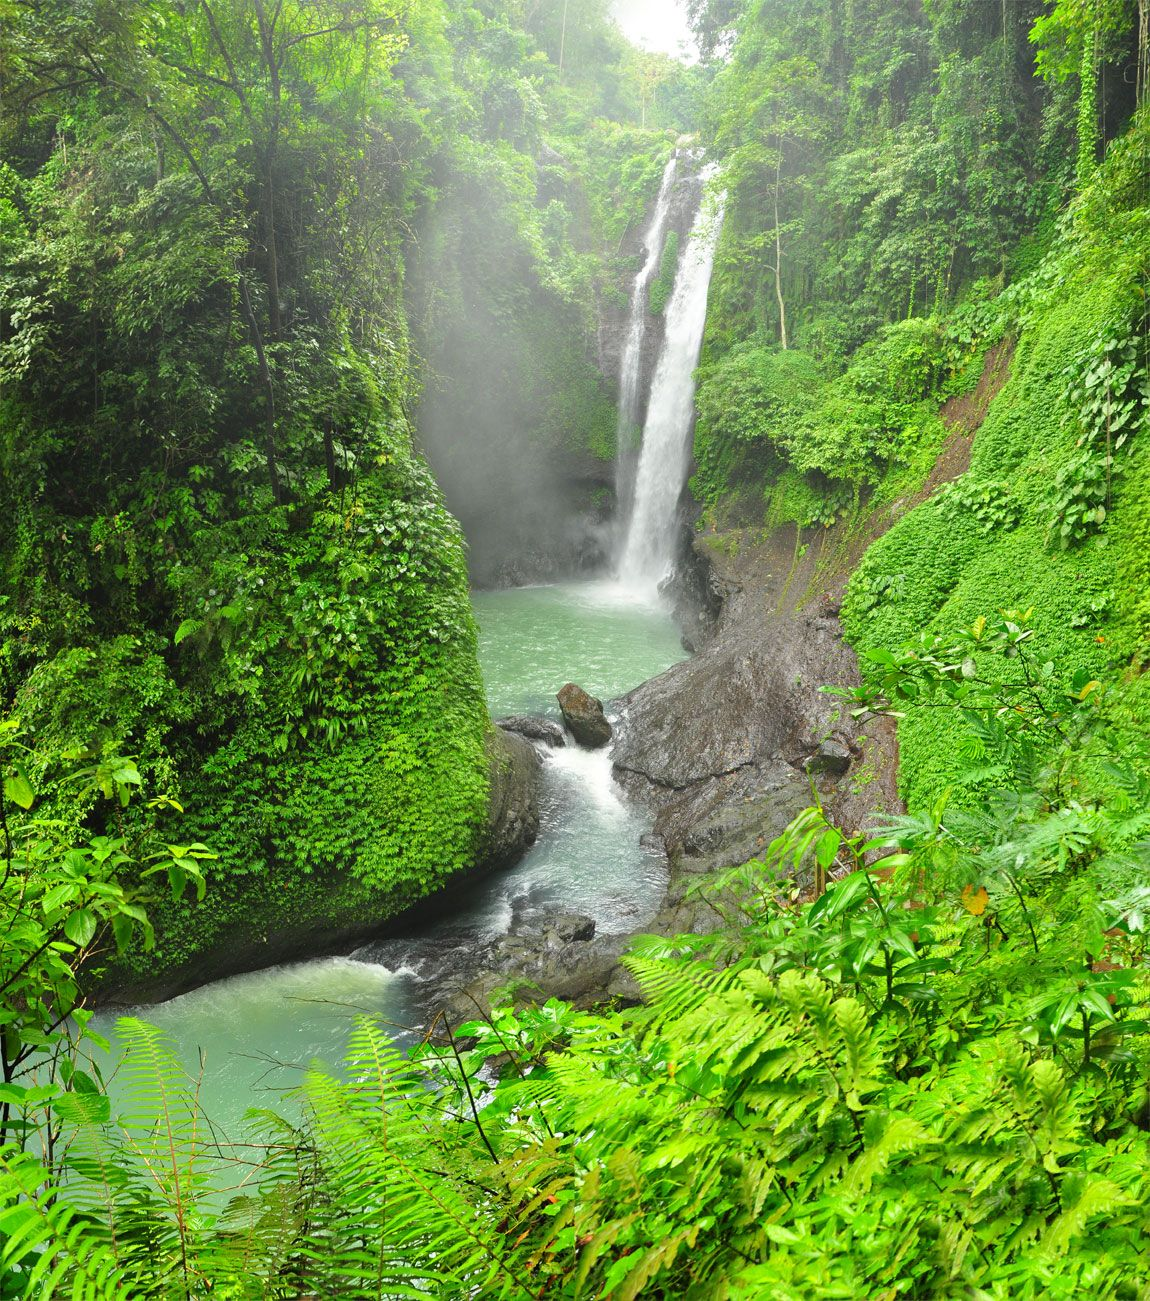 AlingAling Waterfall, Bali 1 of 7 Waterfalls Pucuk